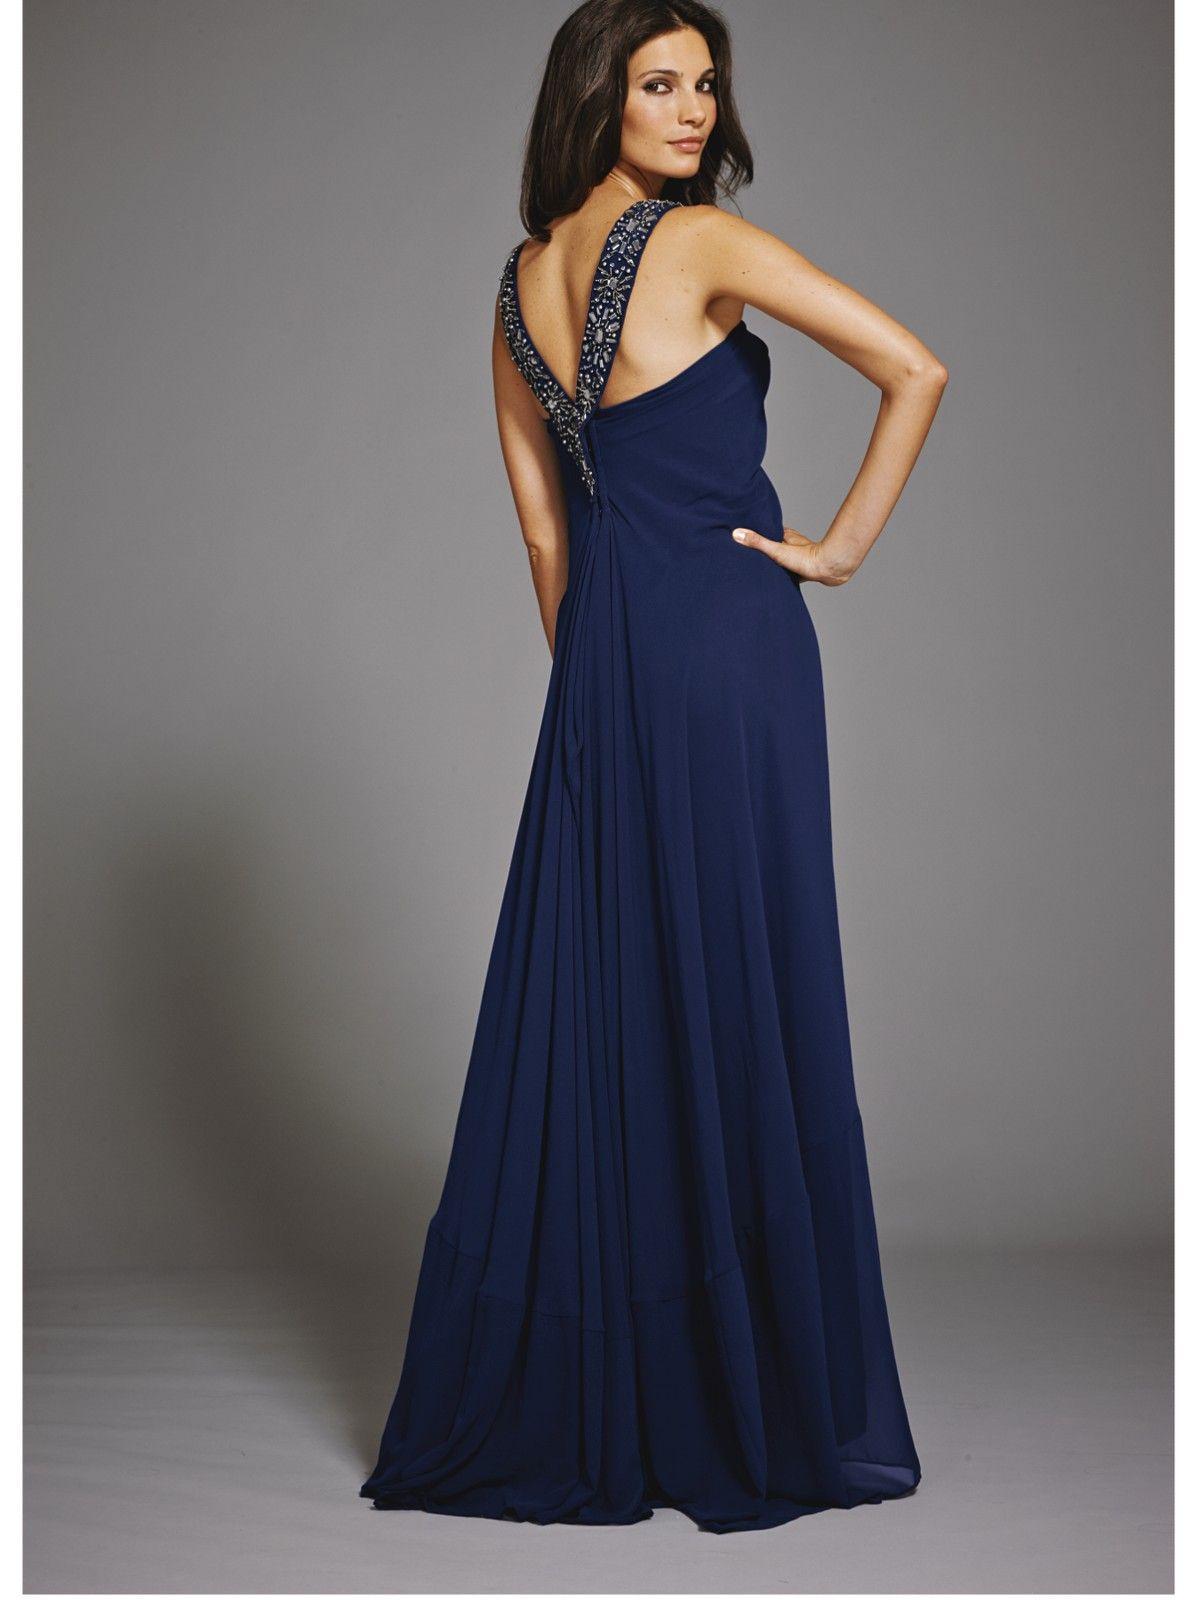 Littlewoods | Bridesmaid dresses | Pinterest